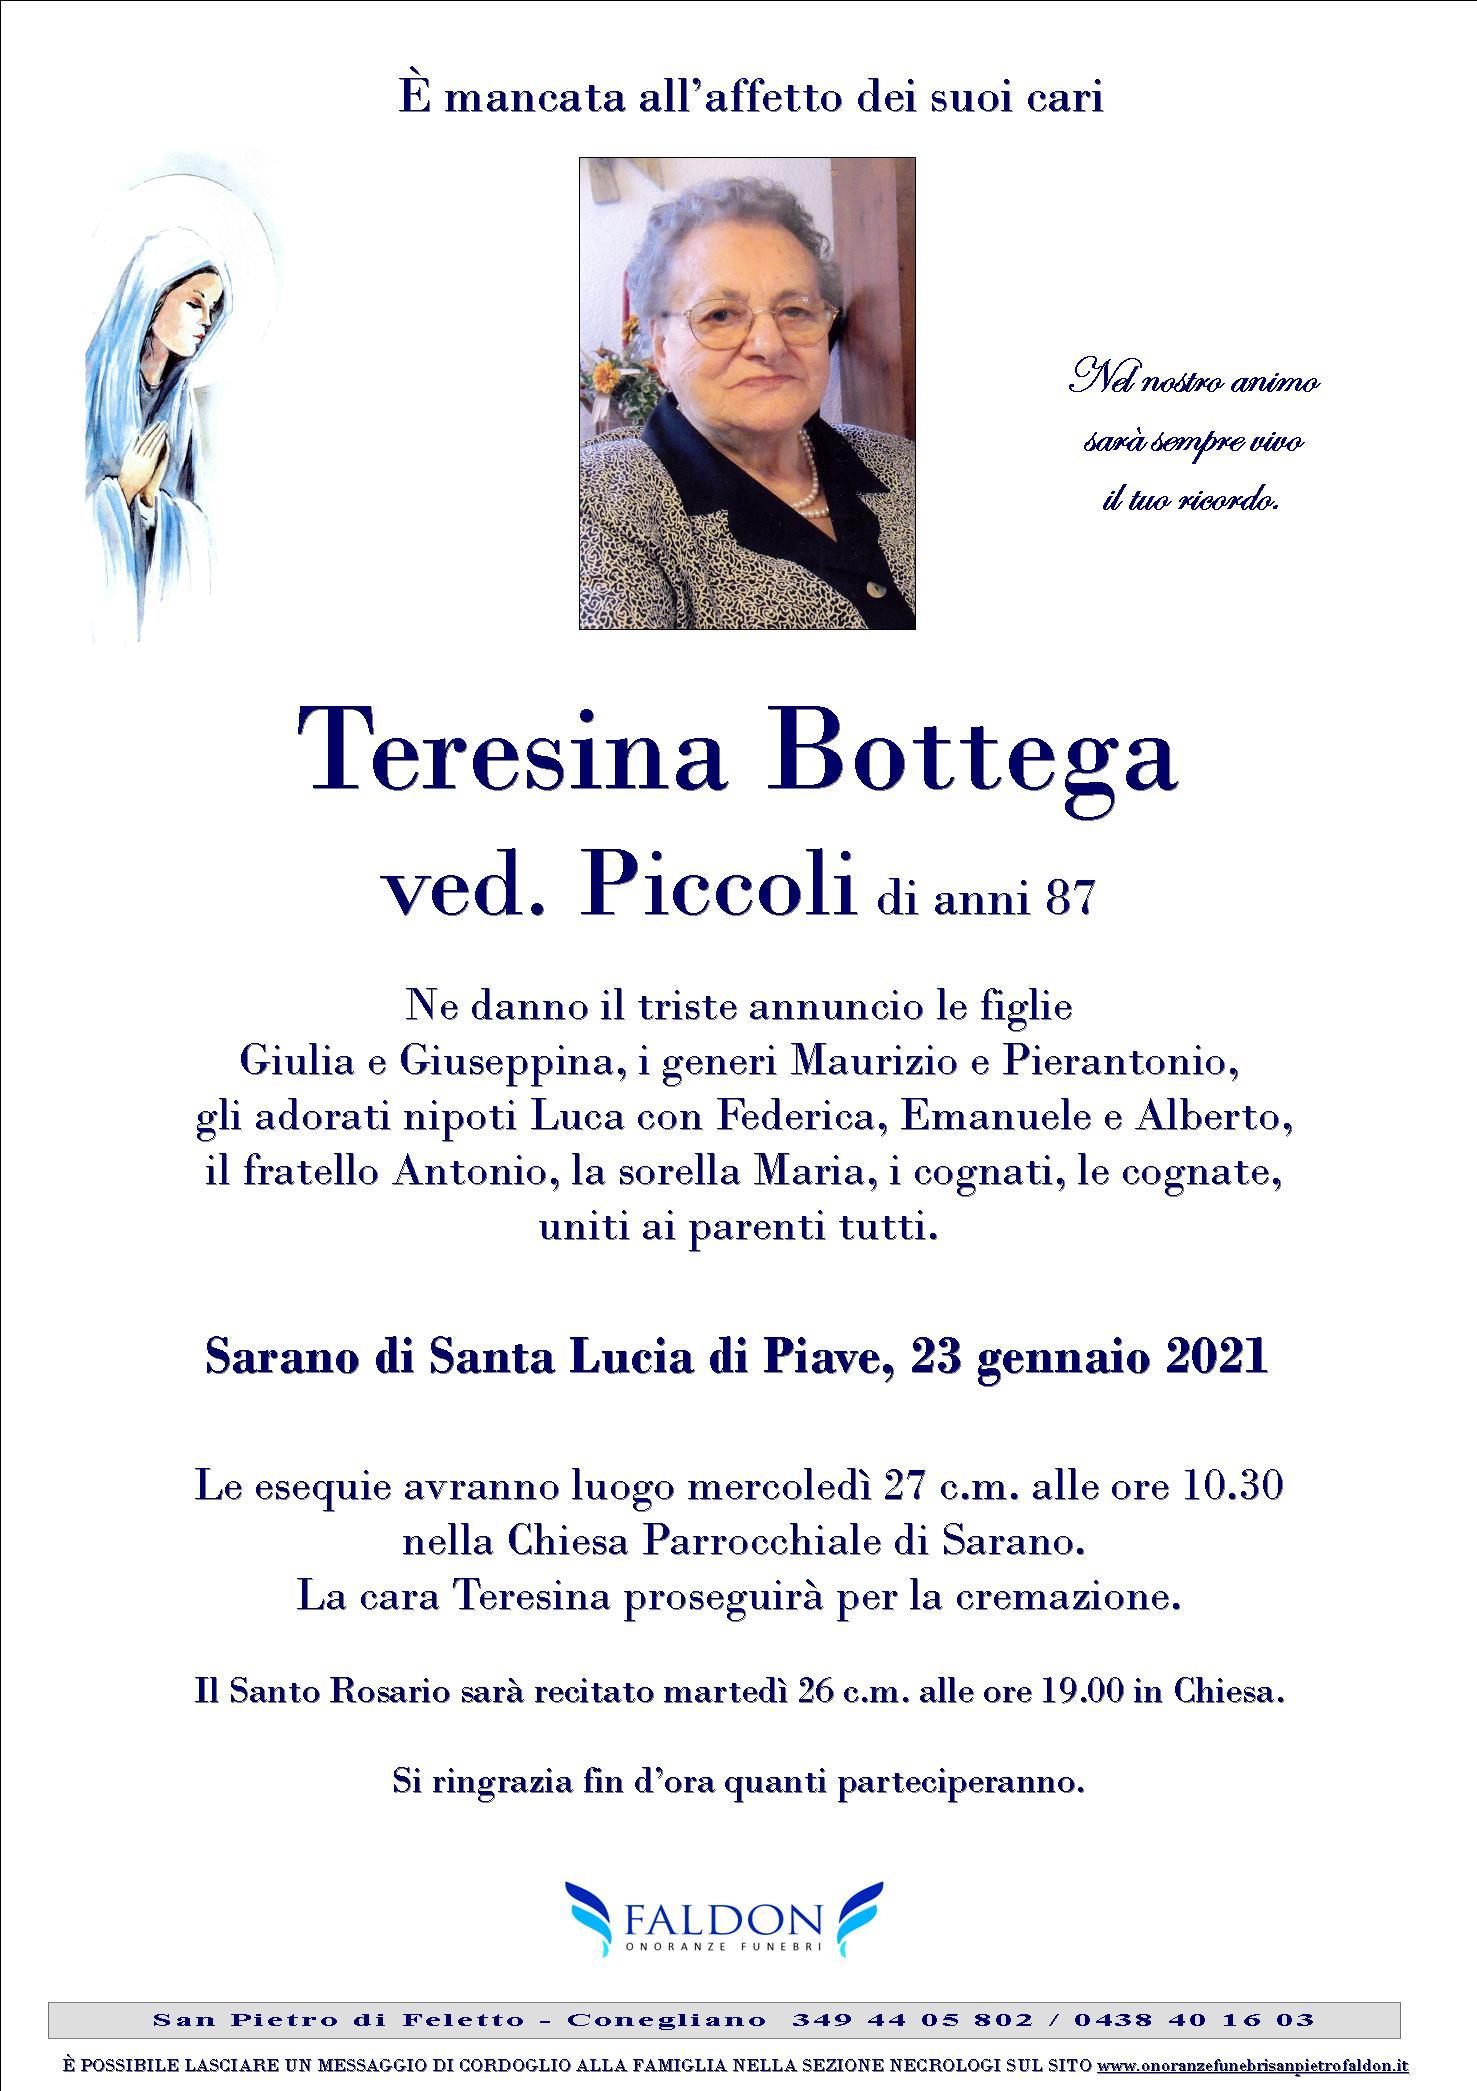 Teresina Bottega